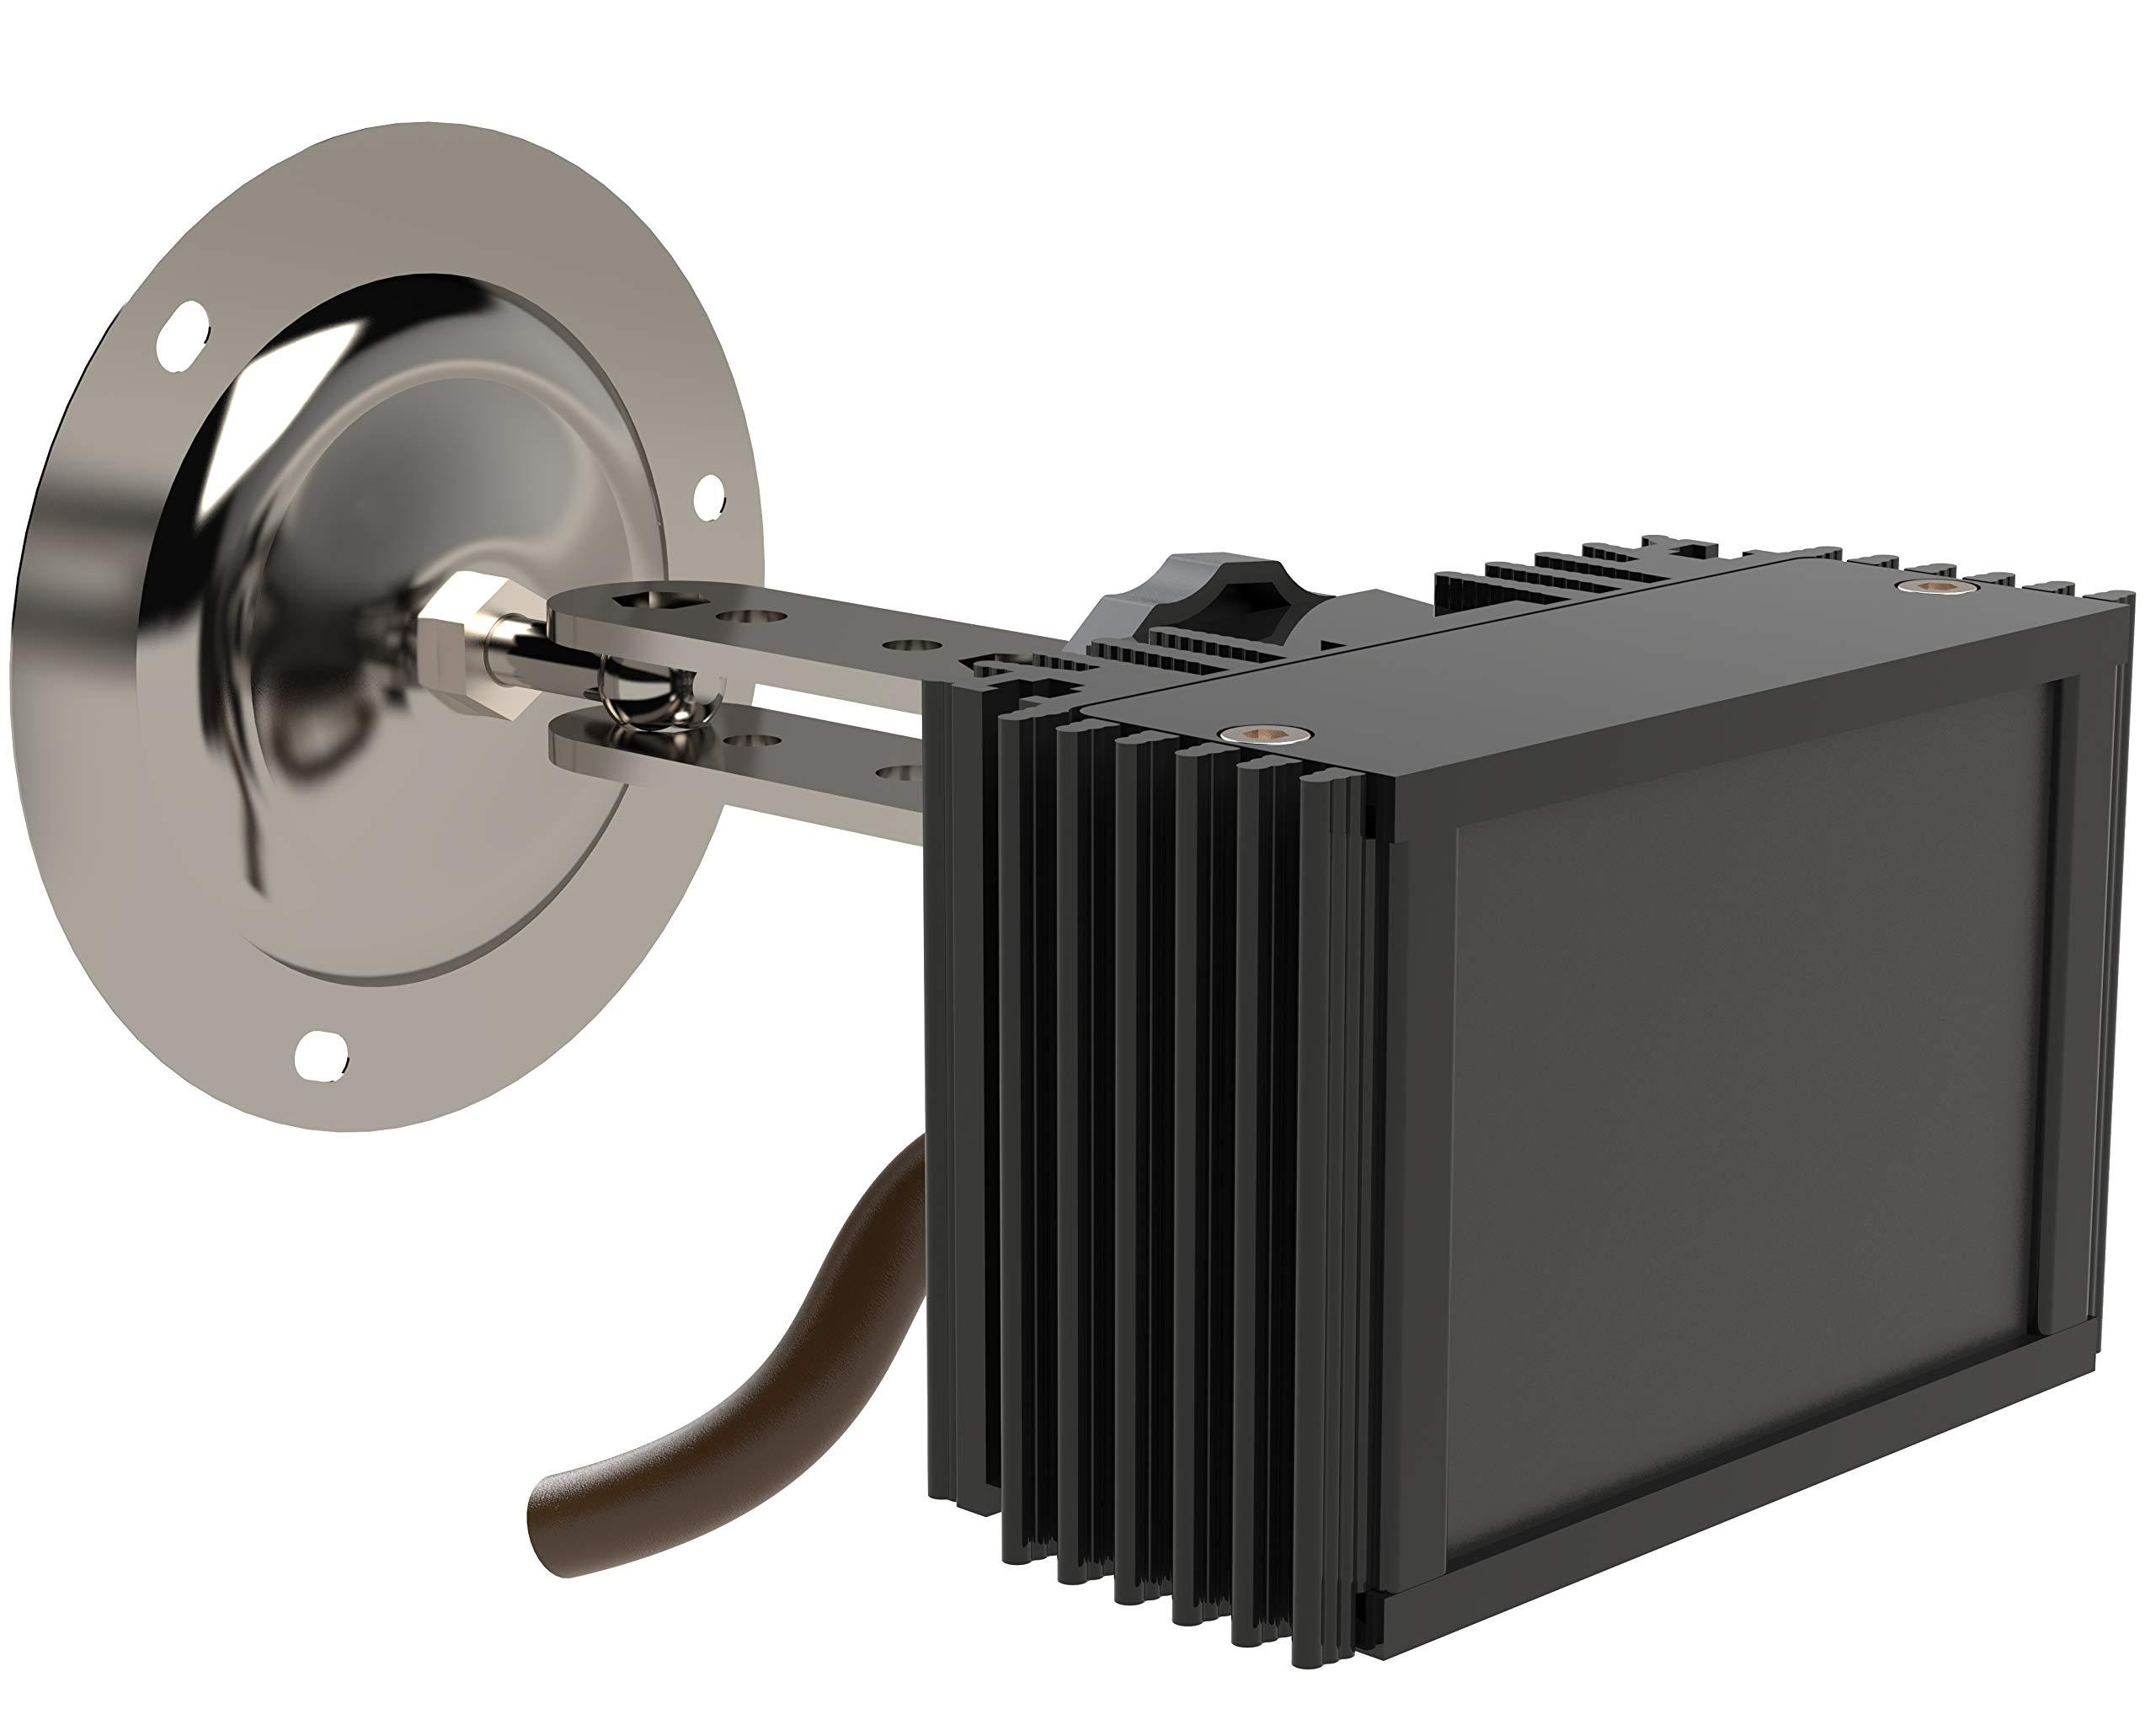 Infrared Illuminator Microlight IR Helios S-90/30 90deg Wide Angle up to 70ft Night Vision Outdoor IP67 by Microlight